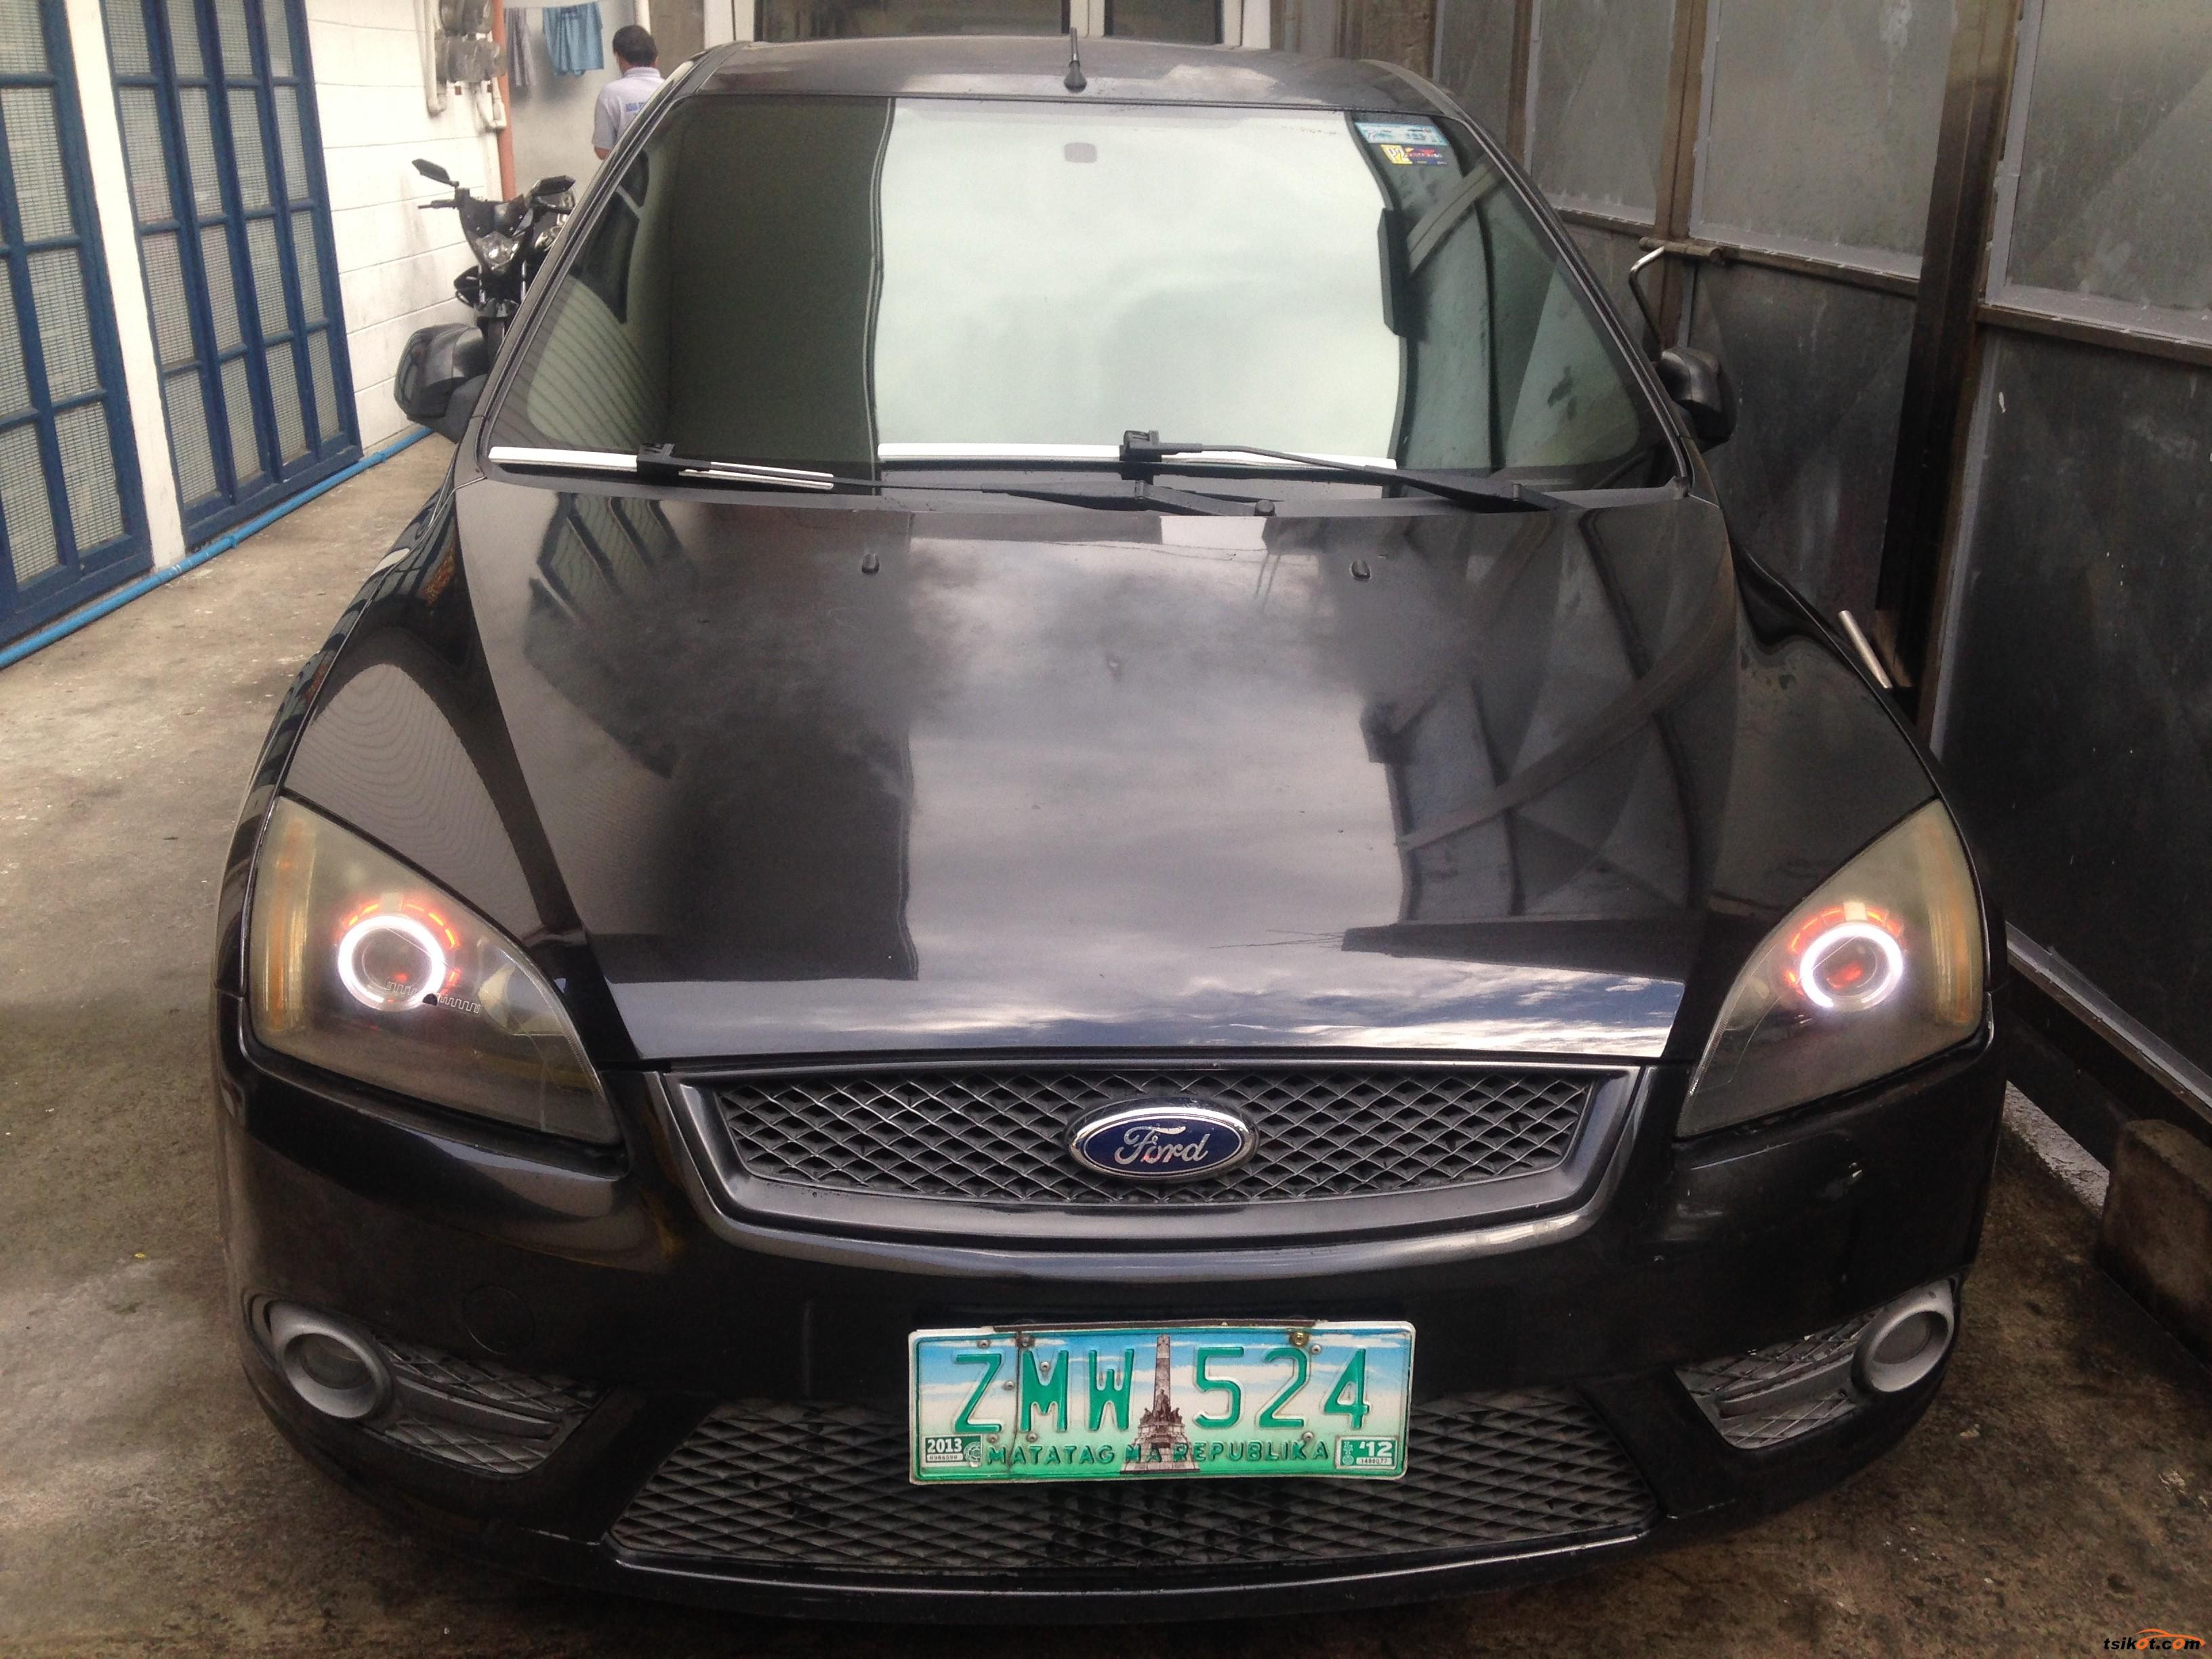 Ford Focus 2007 - 9